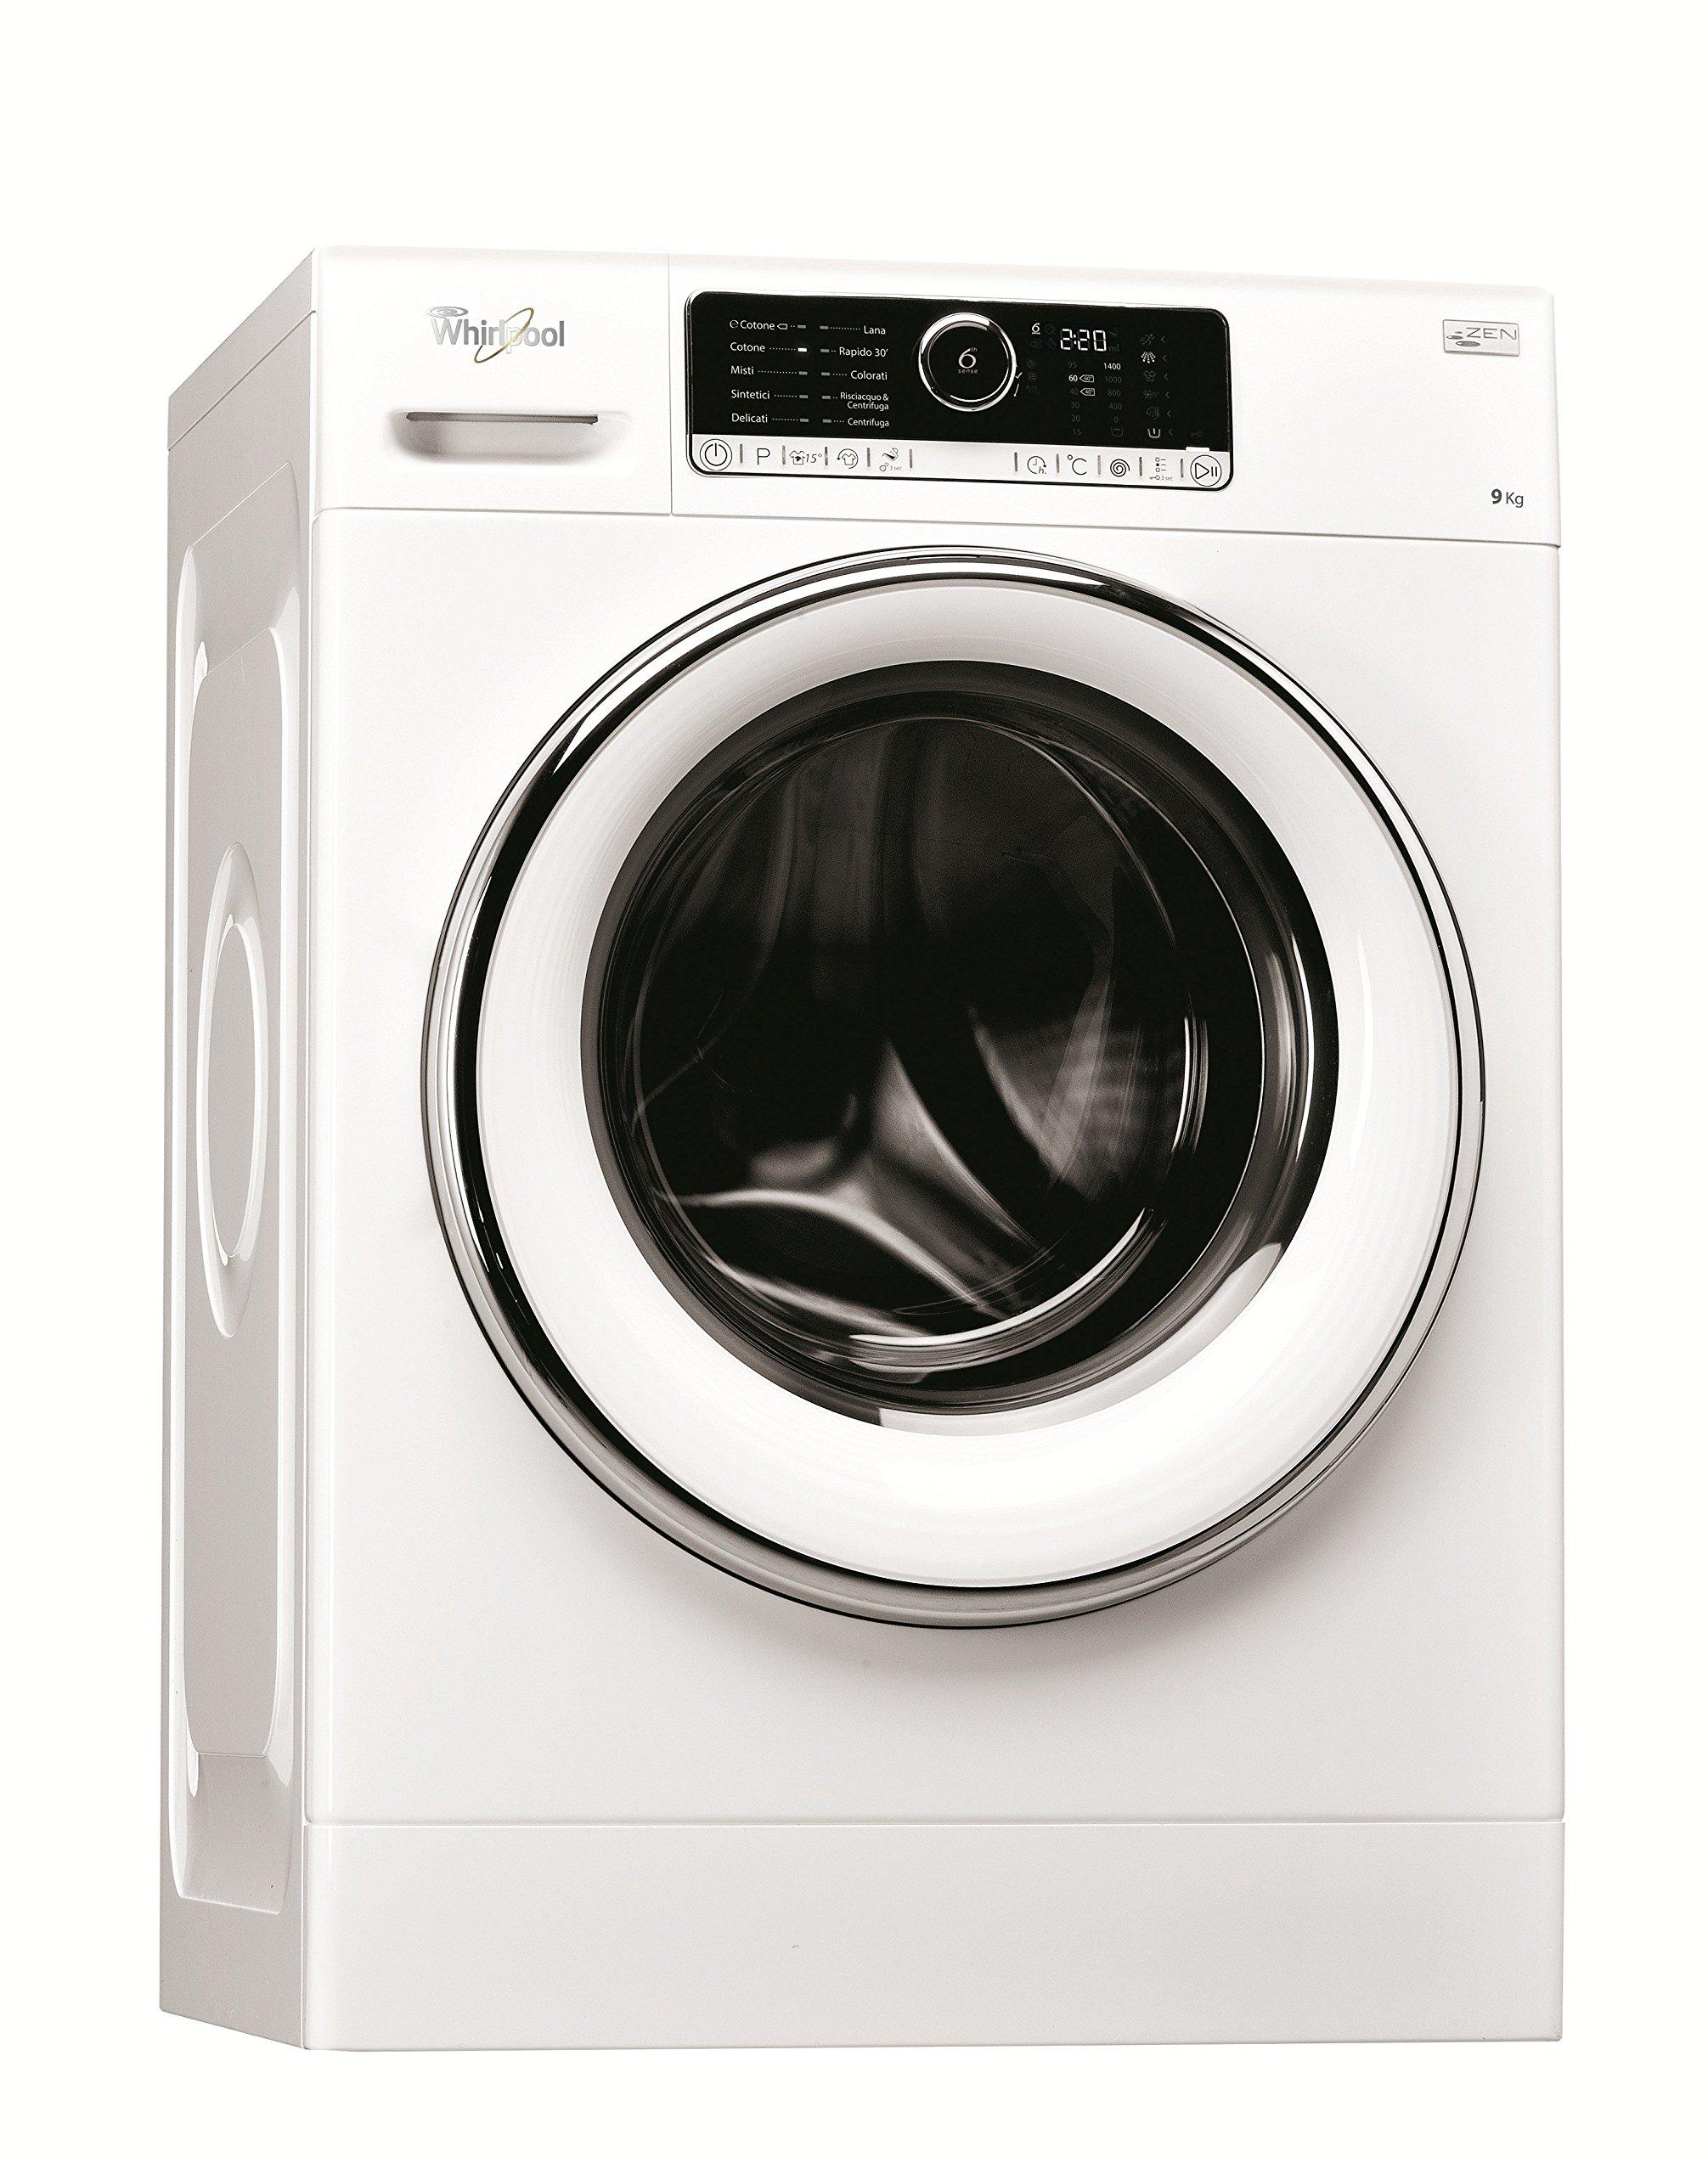 Whirlpool FSCR90421 Freestanding Front-load 9kg 1400RPM A+++-20% White washing machine - washing ma